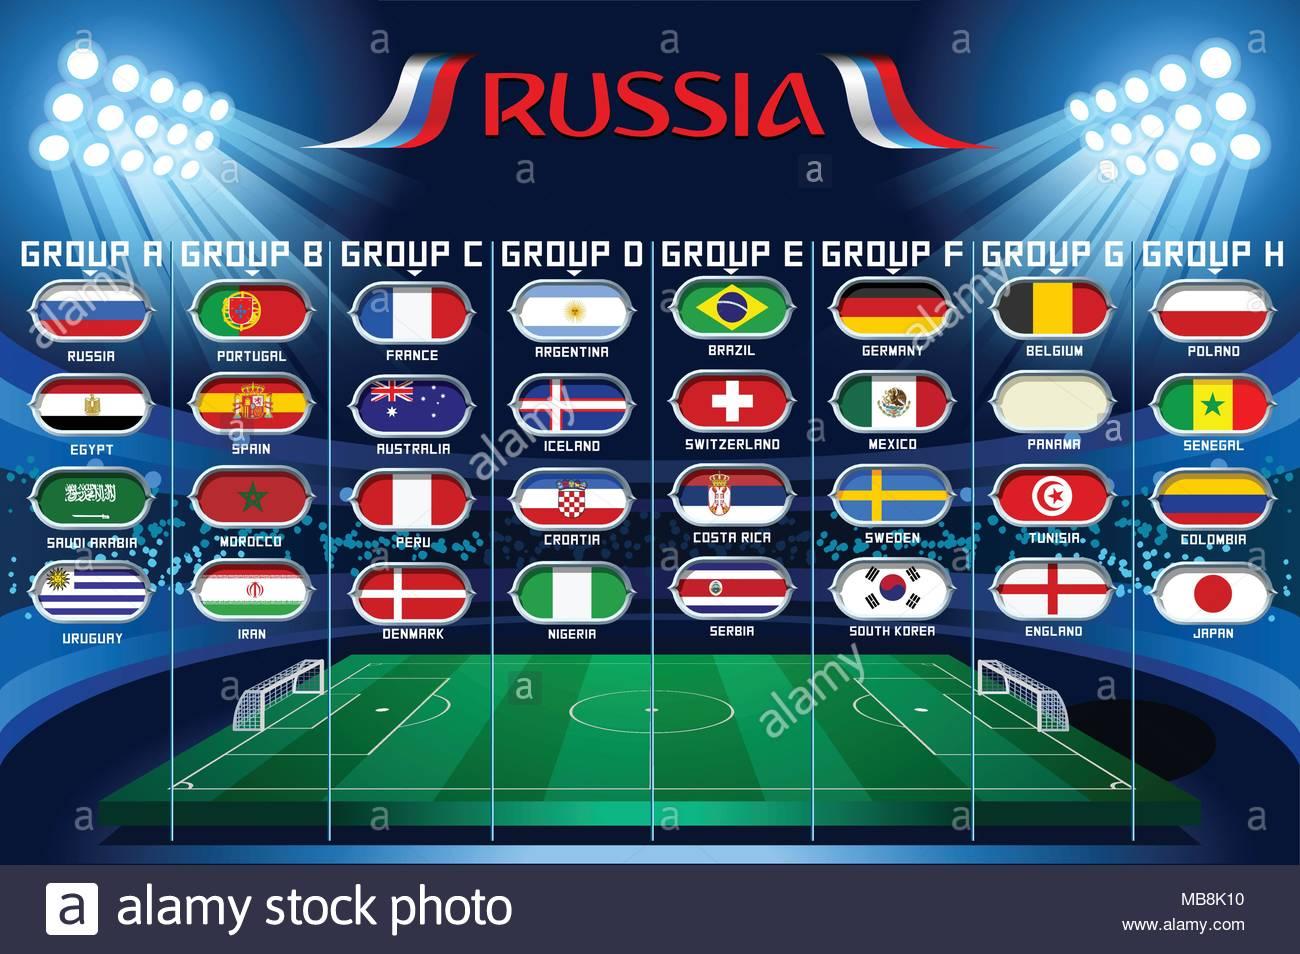 Football set of world championship groups. Russia football ...